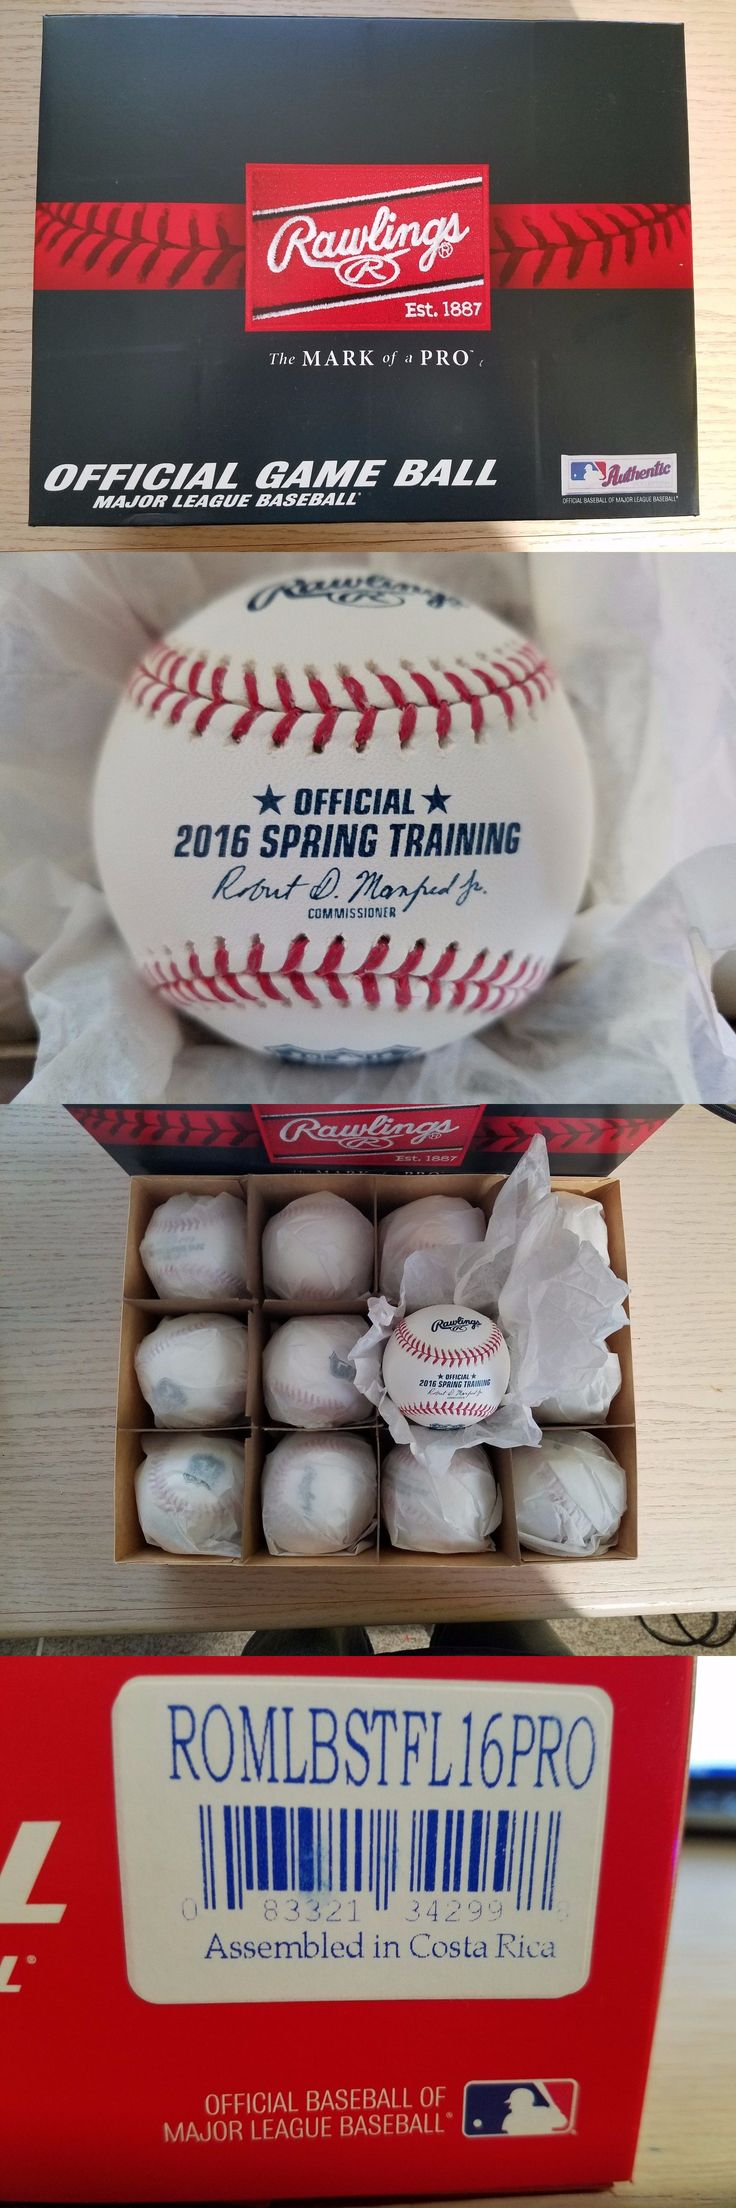 Baseballs 73893: 1 Dozen 12 New Rawlings Official 2016 Spring Training Fl Major League Baseballs -> BUY IT NOW ONLY: $110 on eBay!